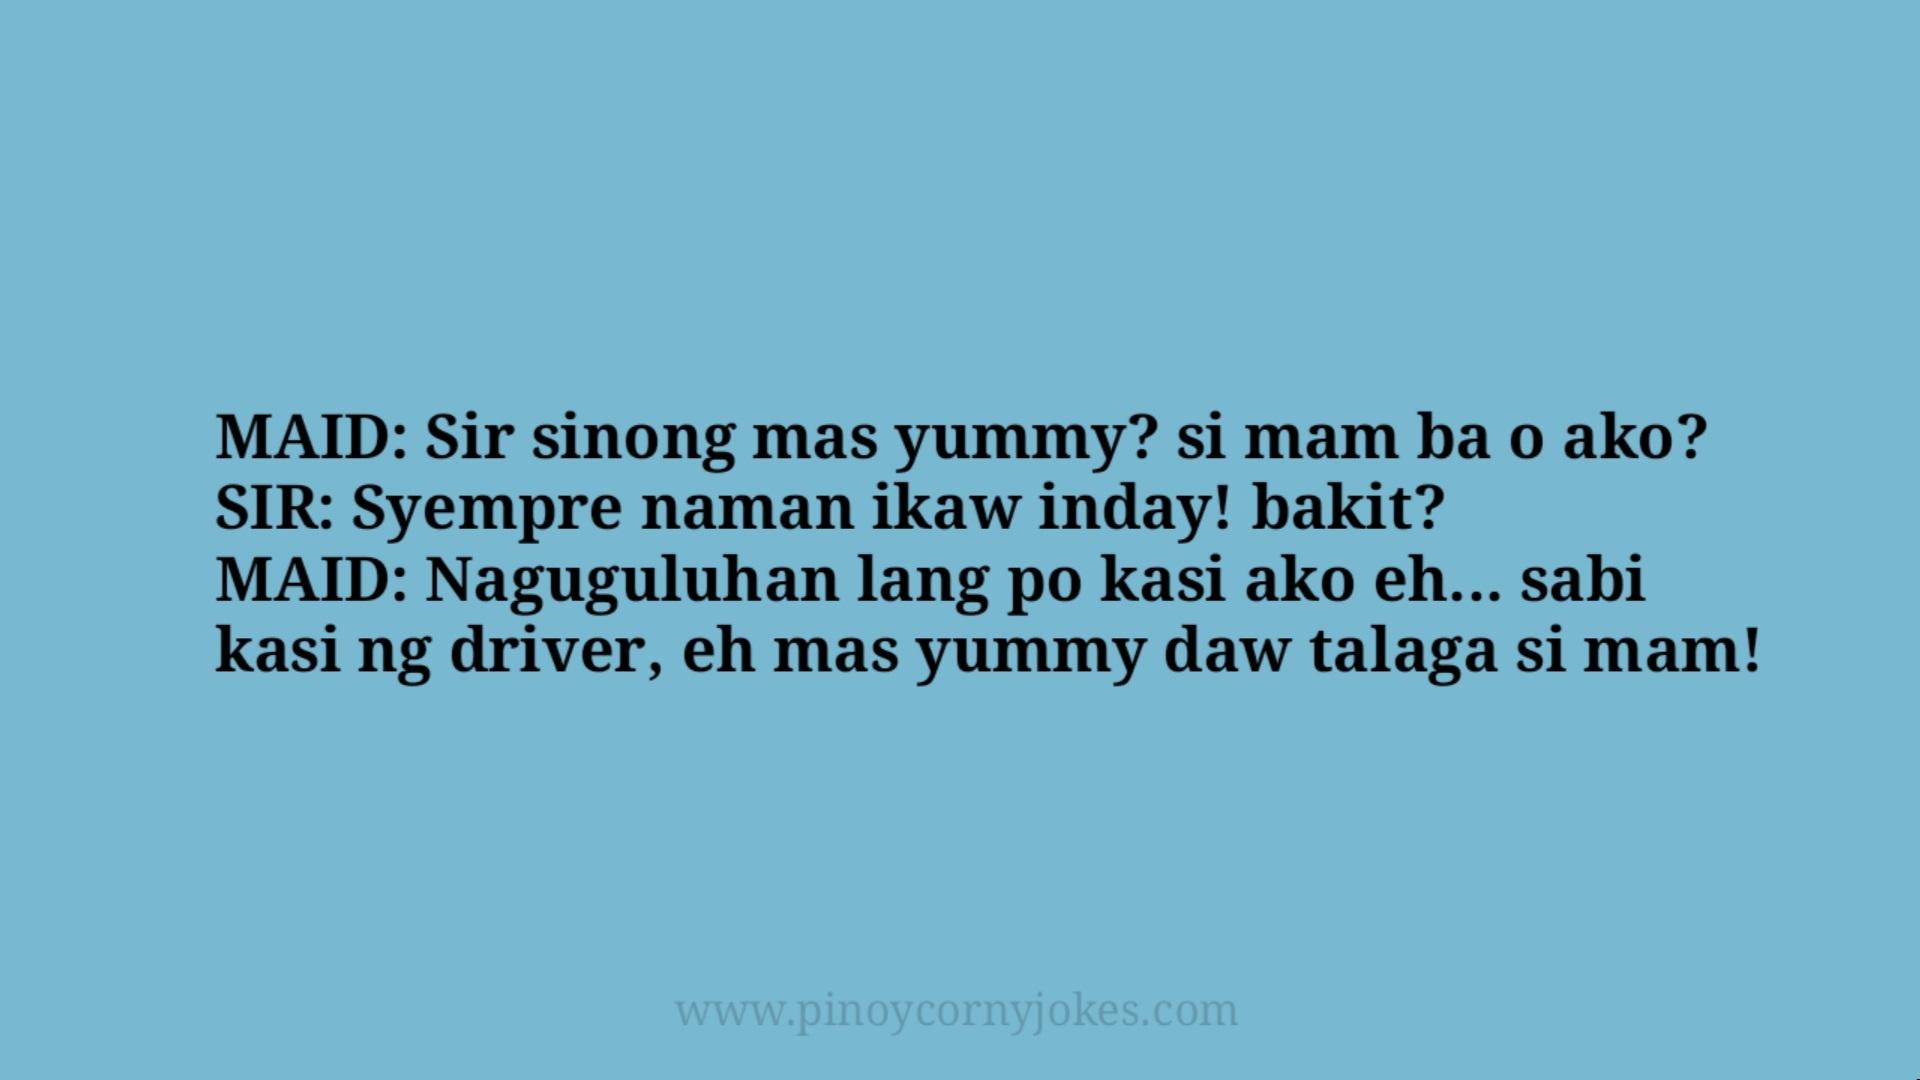 sino mas yummy best yaya tagalog jokes 2021